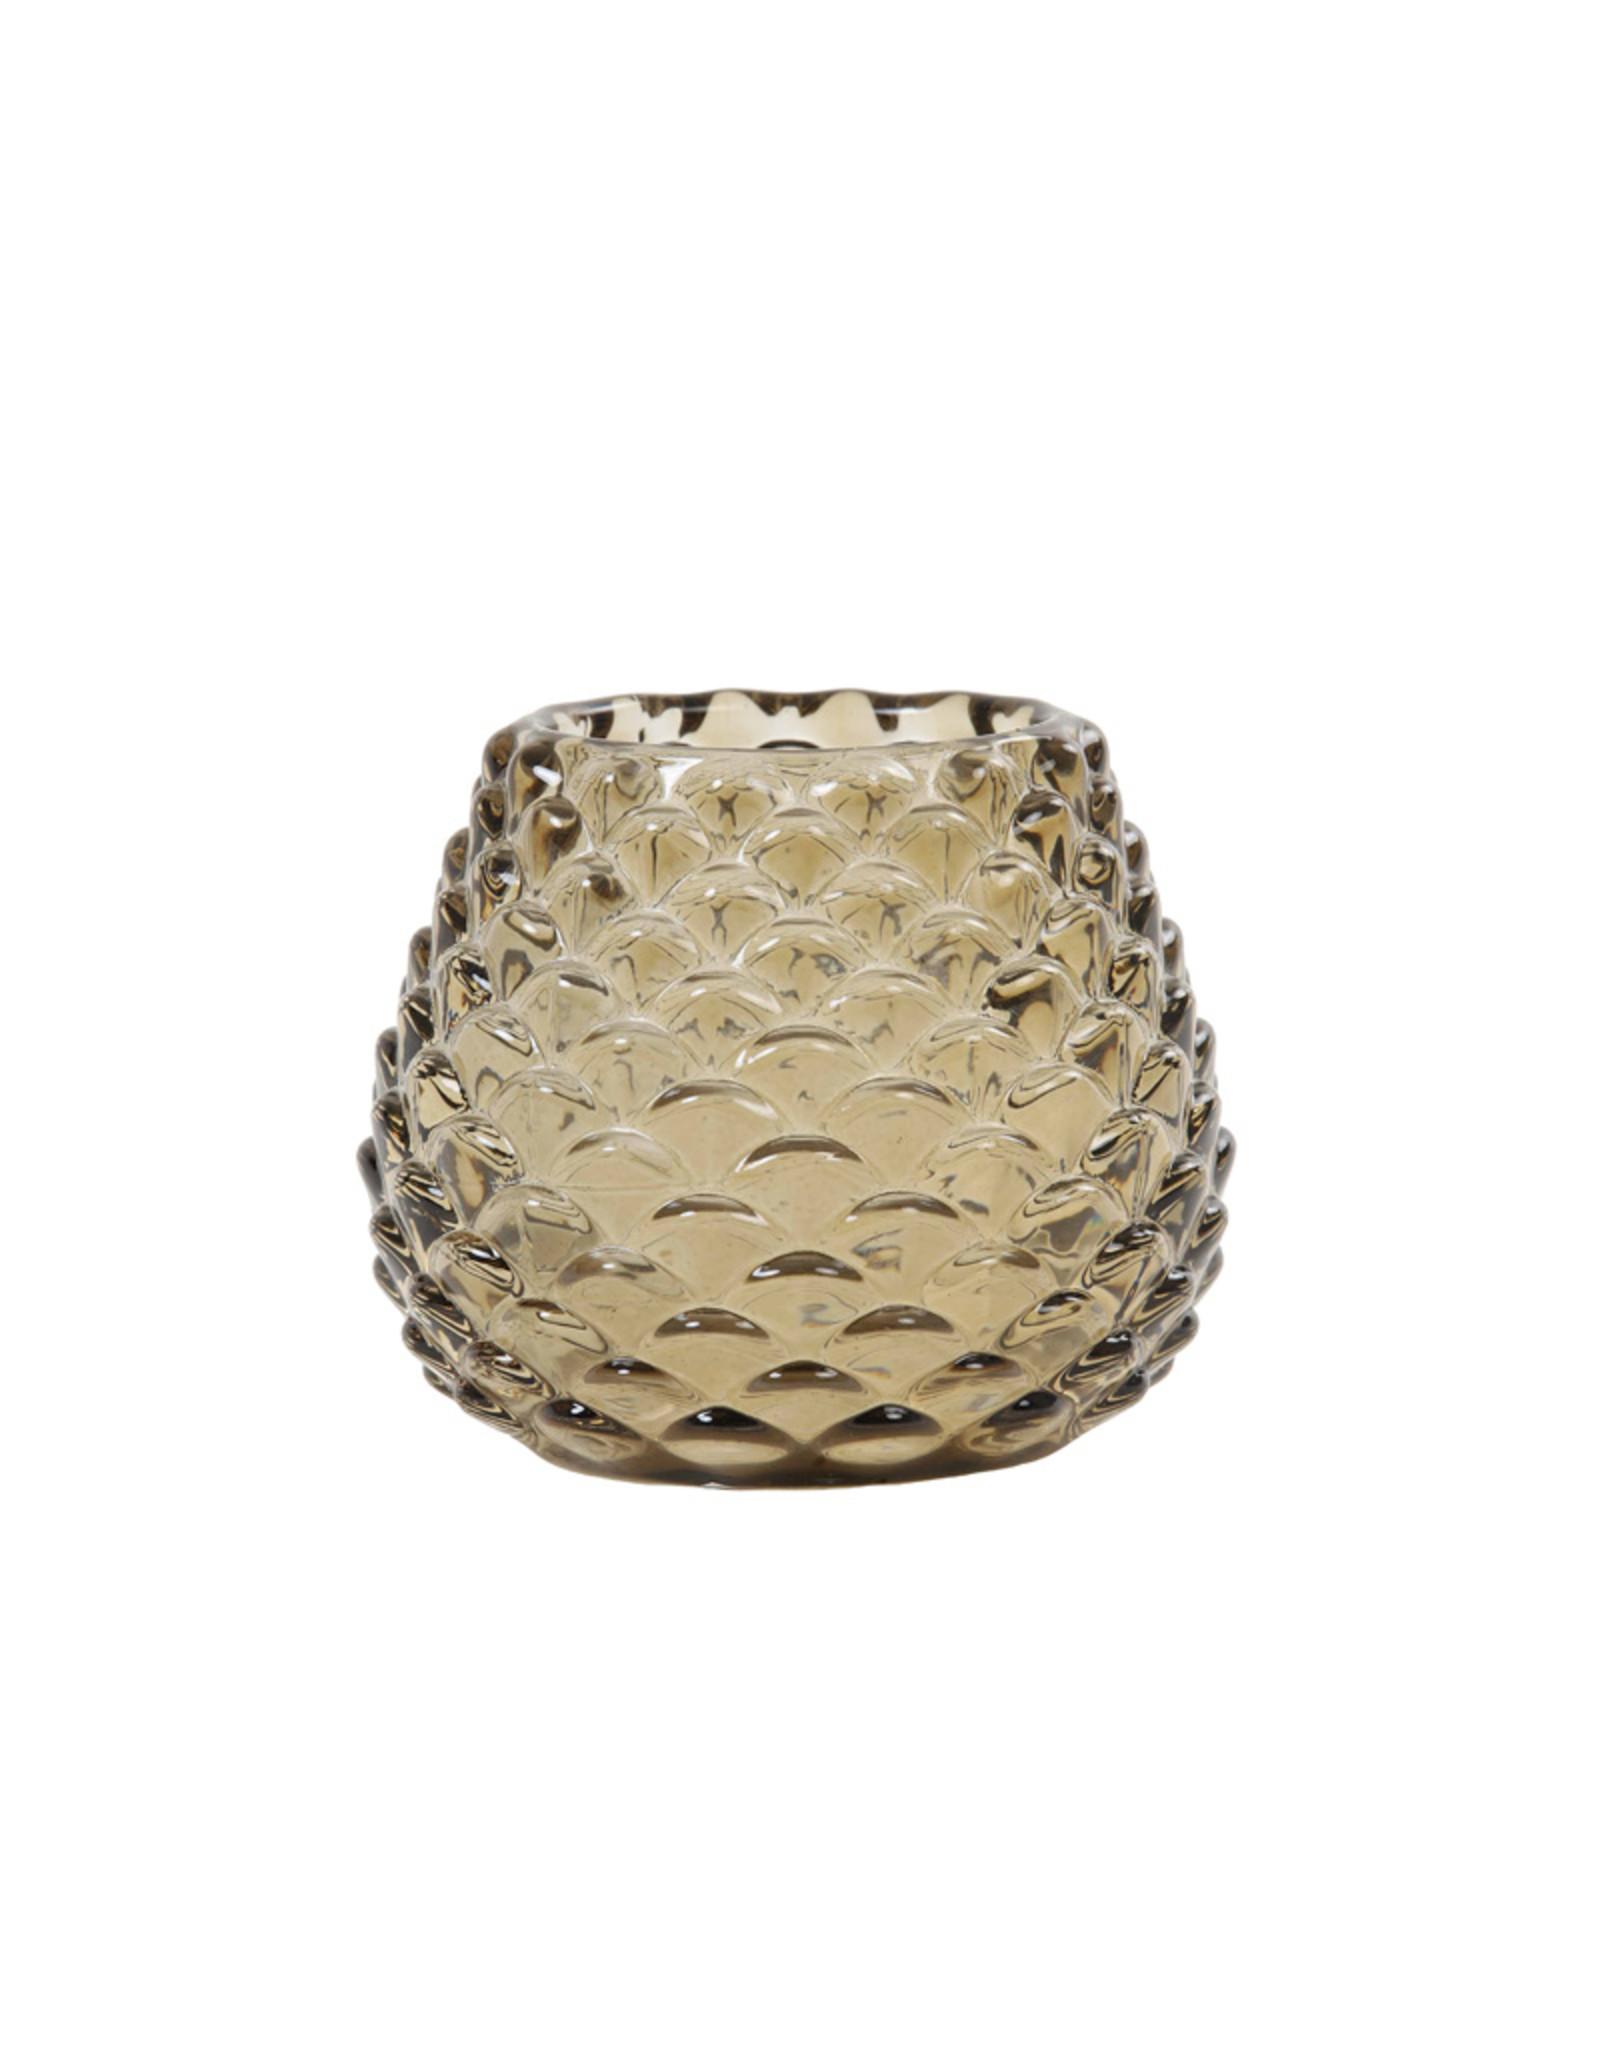 Light & Living Theelicht 10x8.5cm Levay glas bruin groen